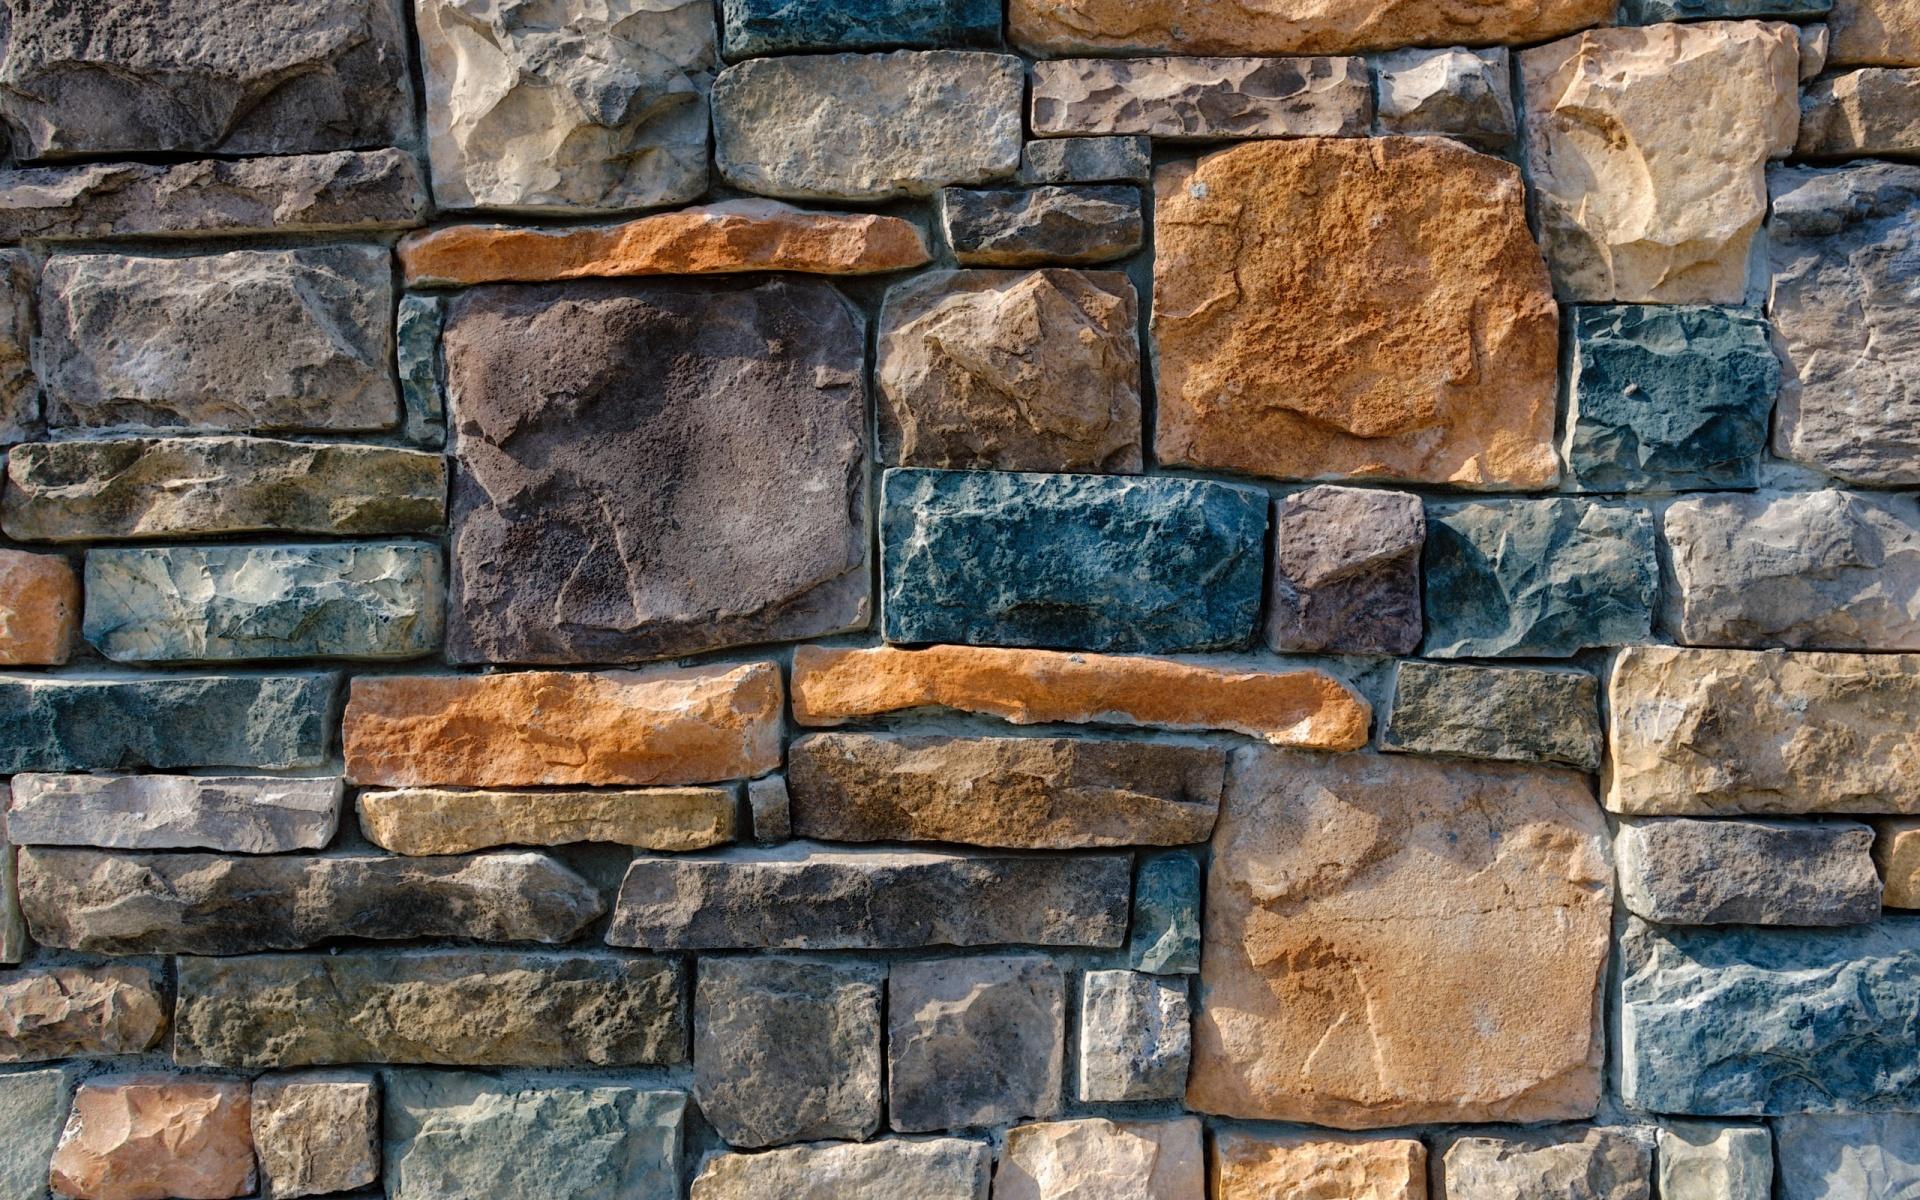 wallpaper mural stonewall depositphotos 2576125 illuminated stone wall 1920x1200